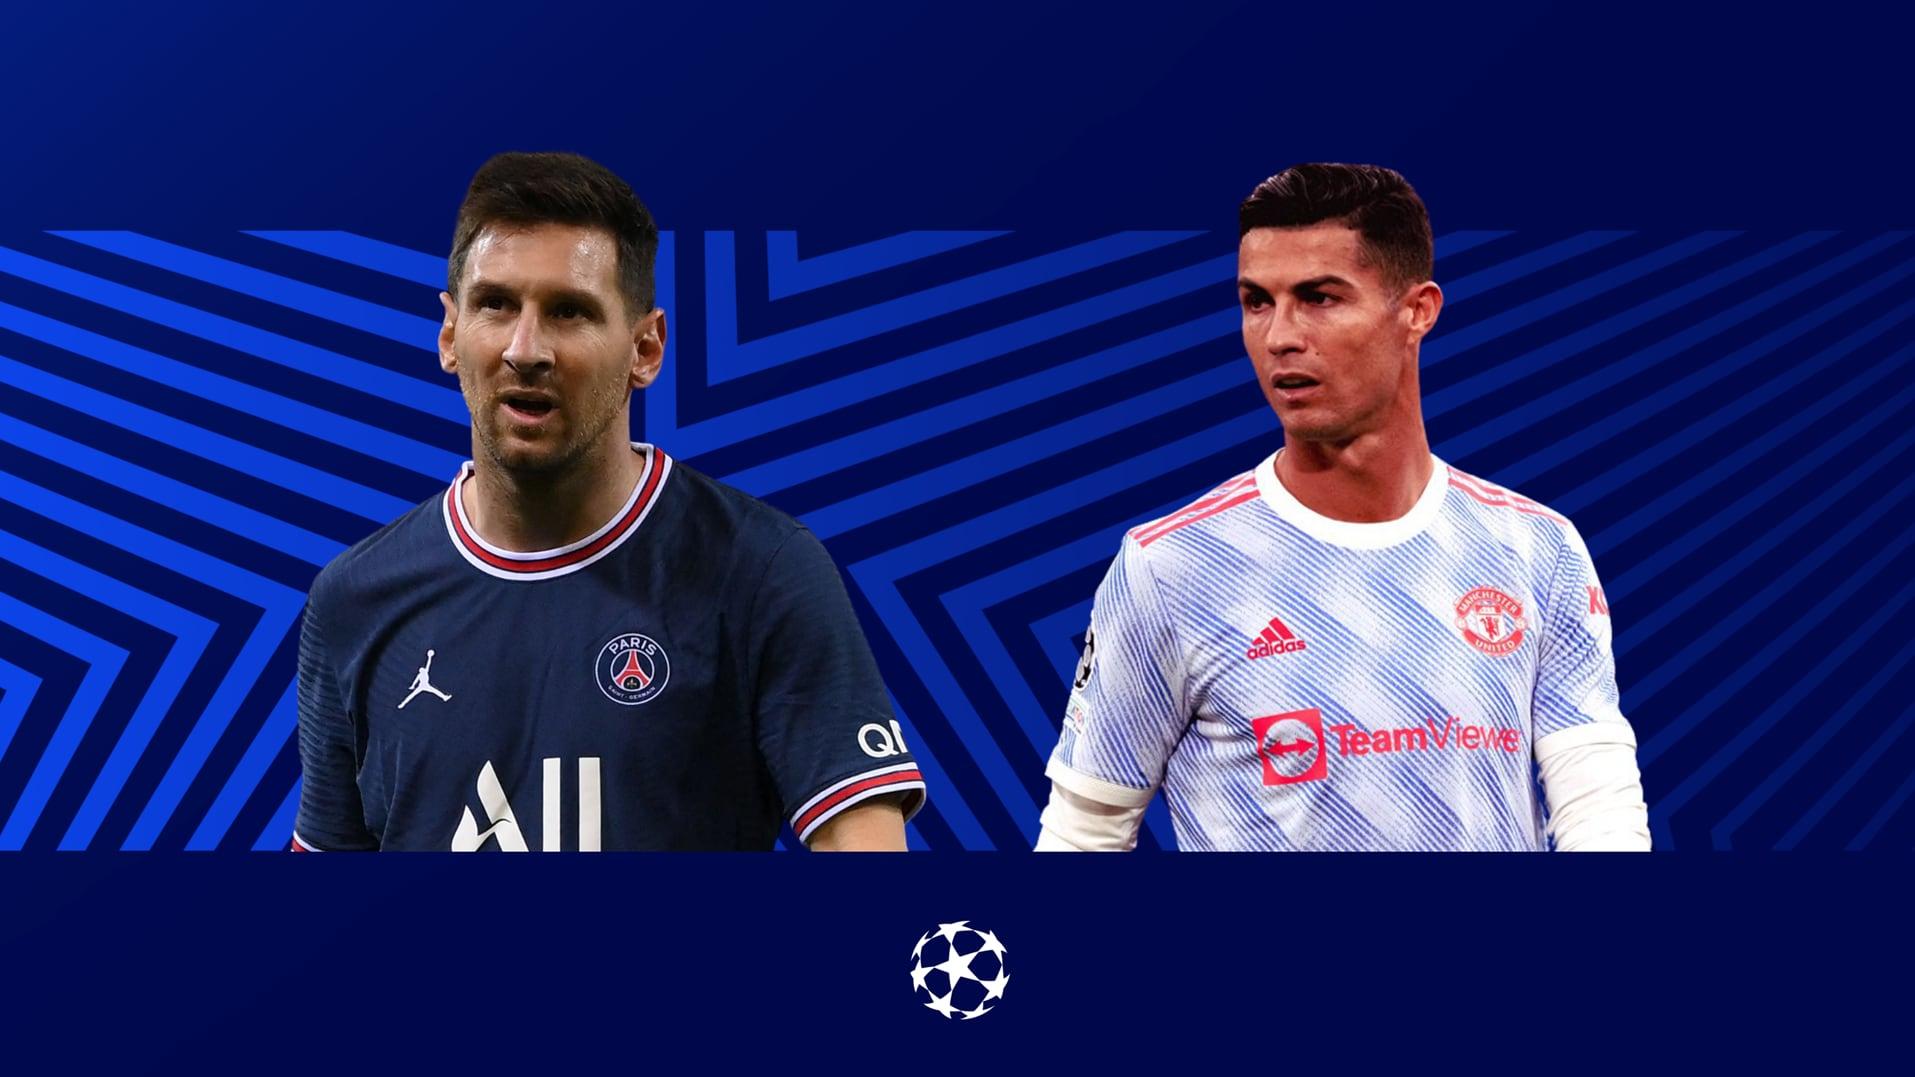 Top-10 Champions League Goals of September